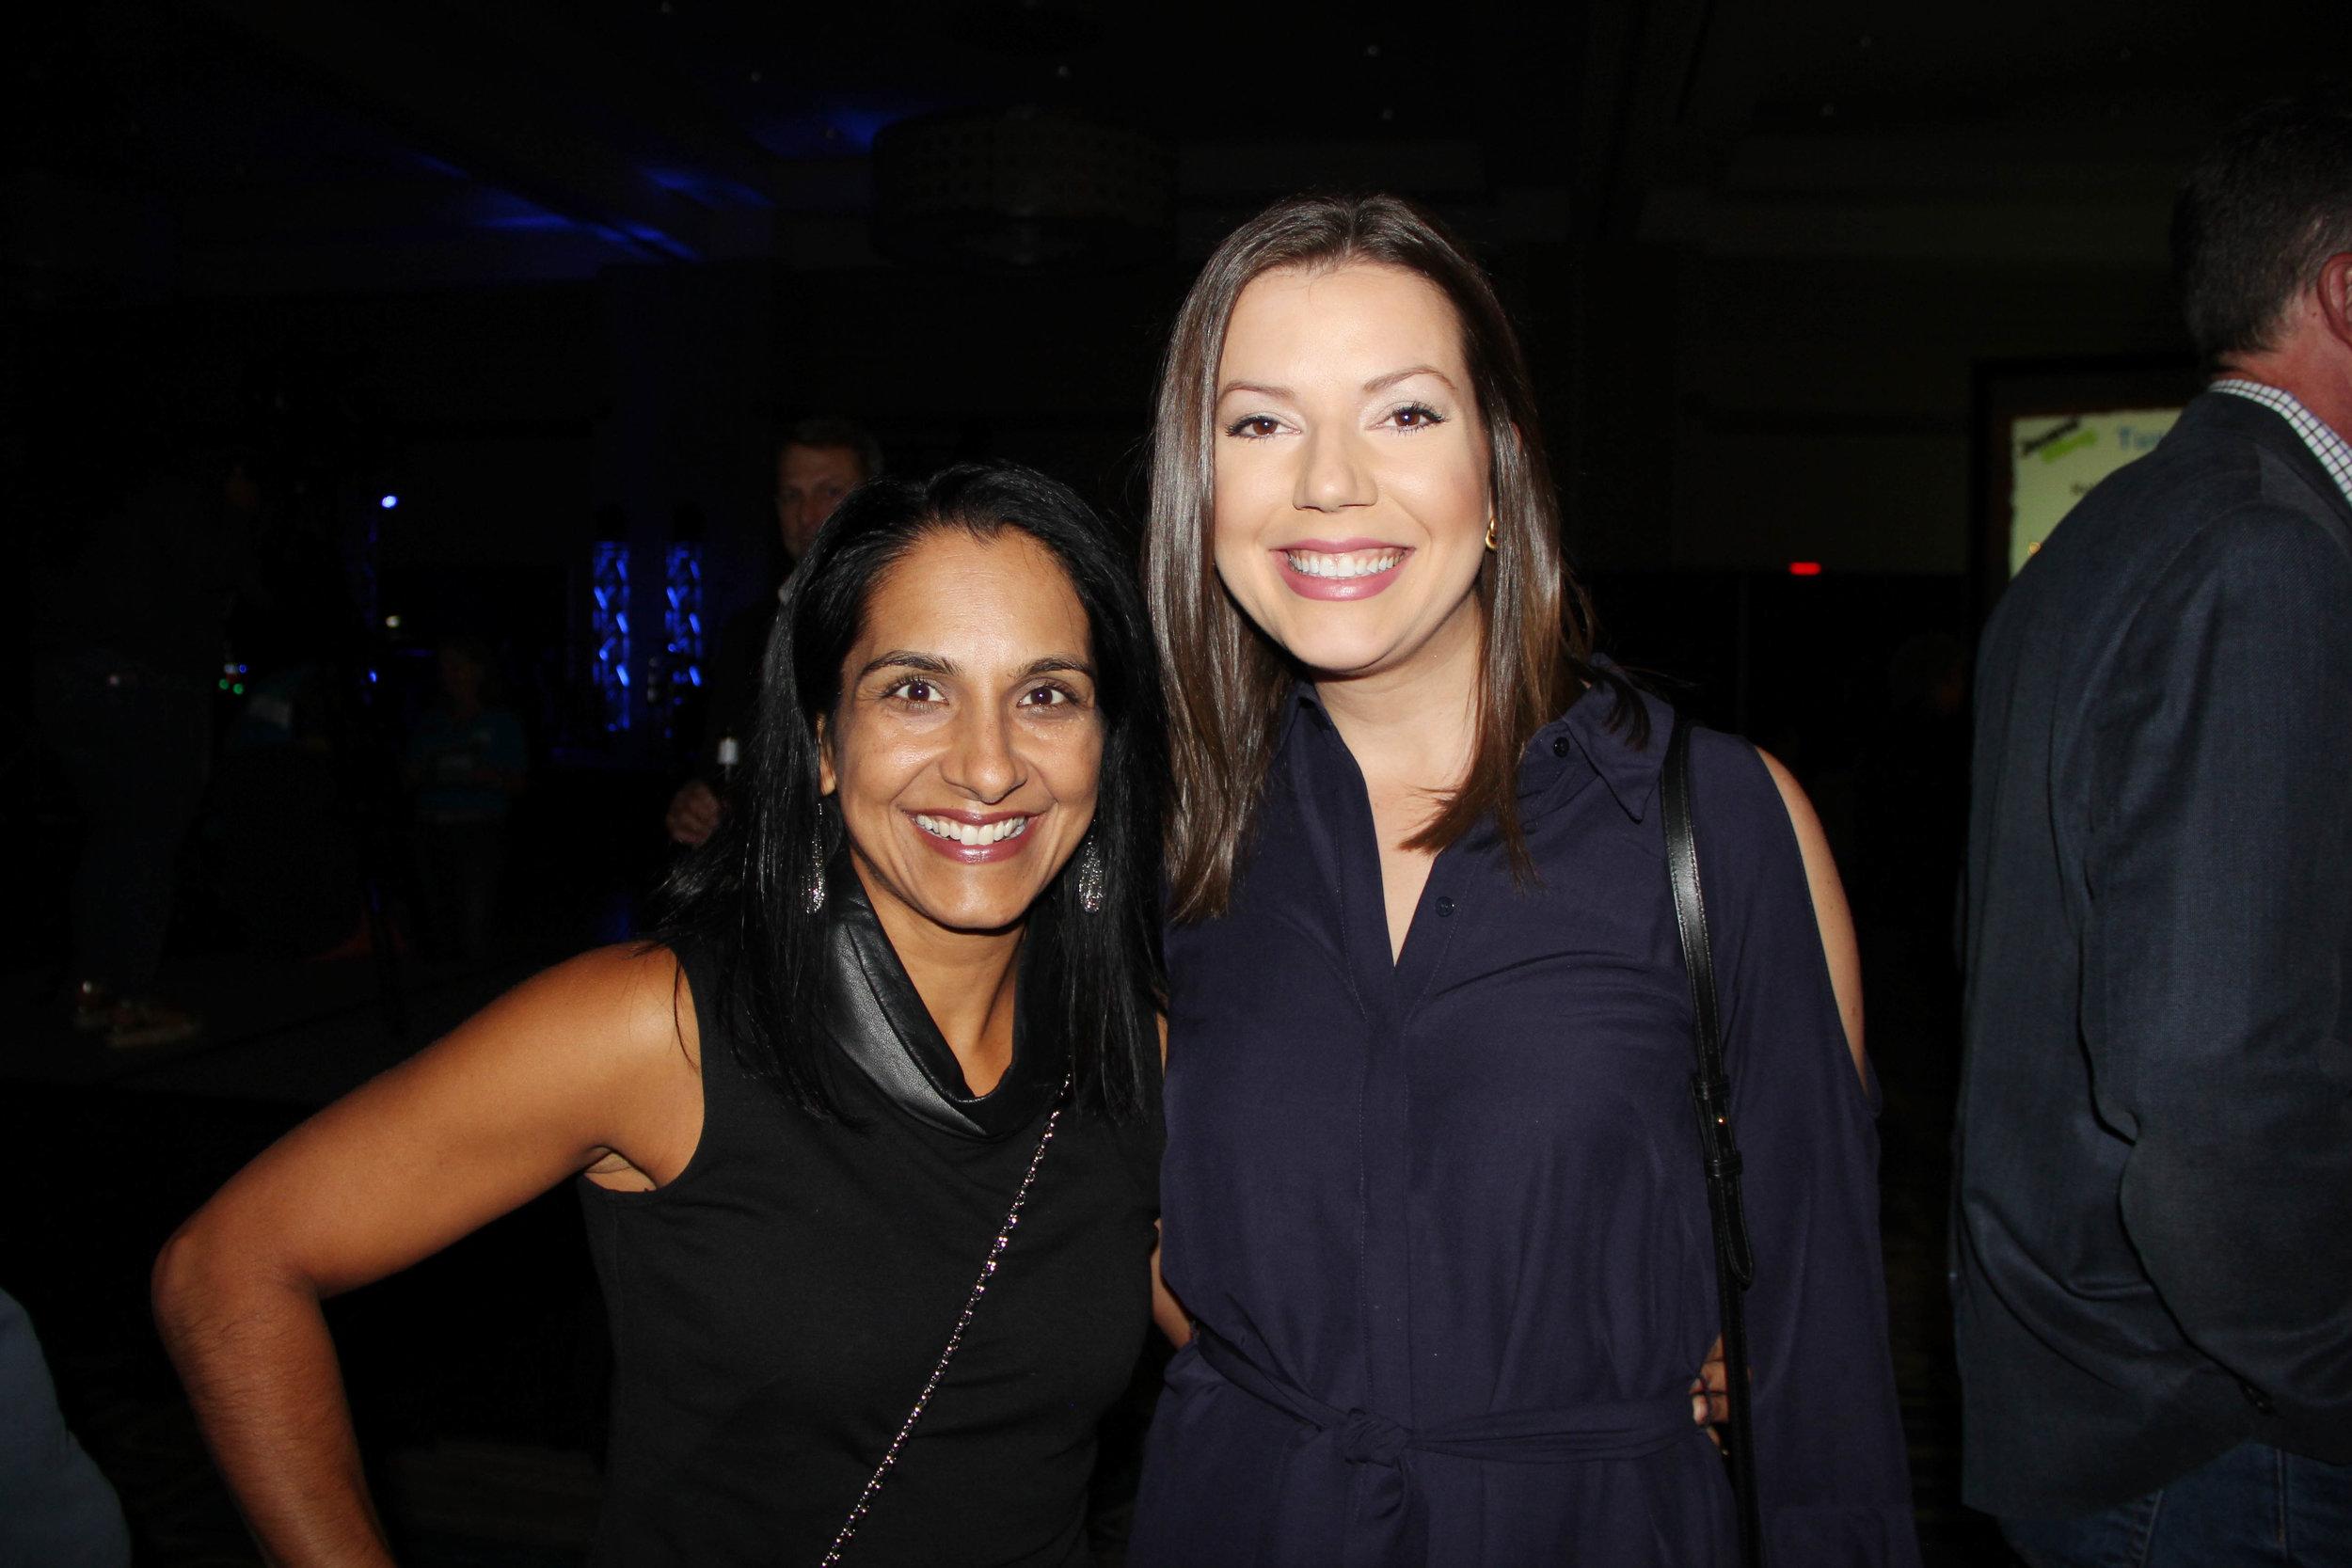 Anitha Kurichety and Rachael Potter